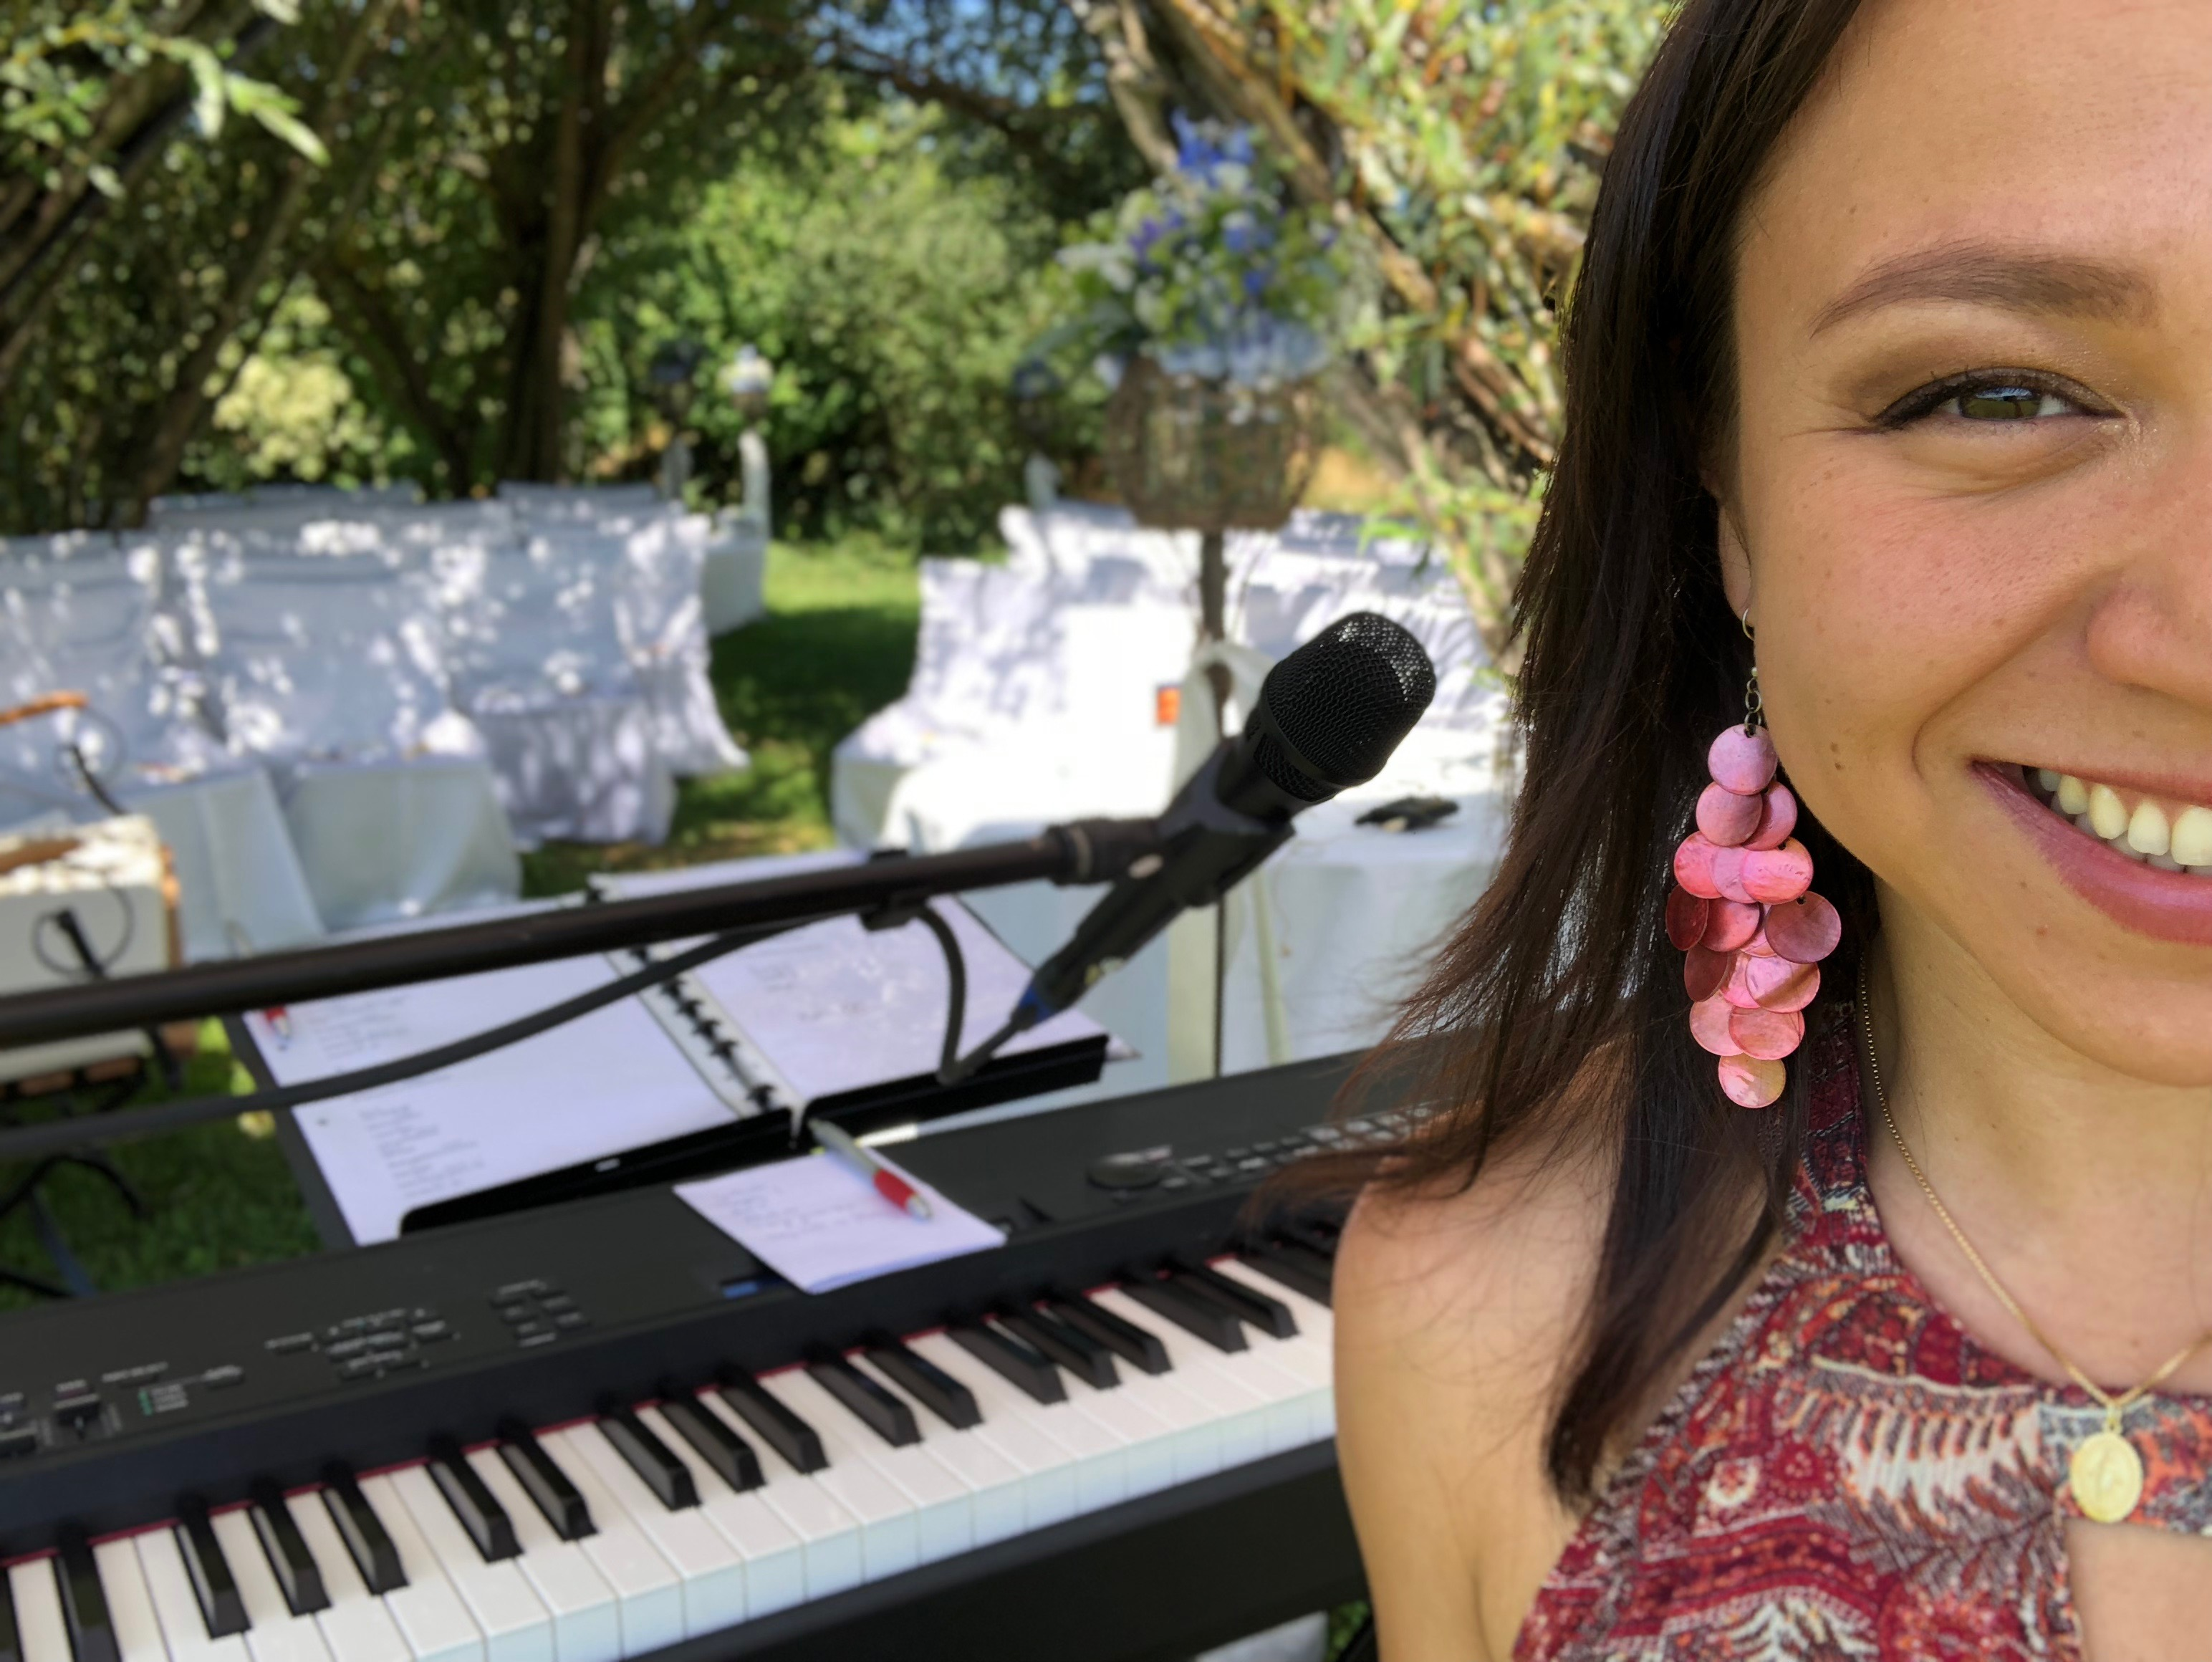 Voice wedding